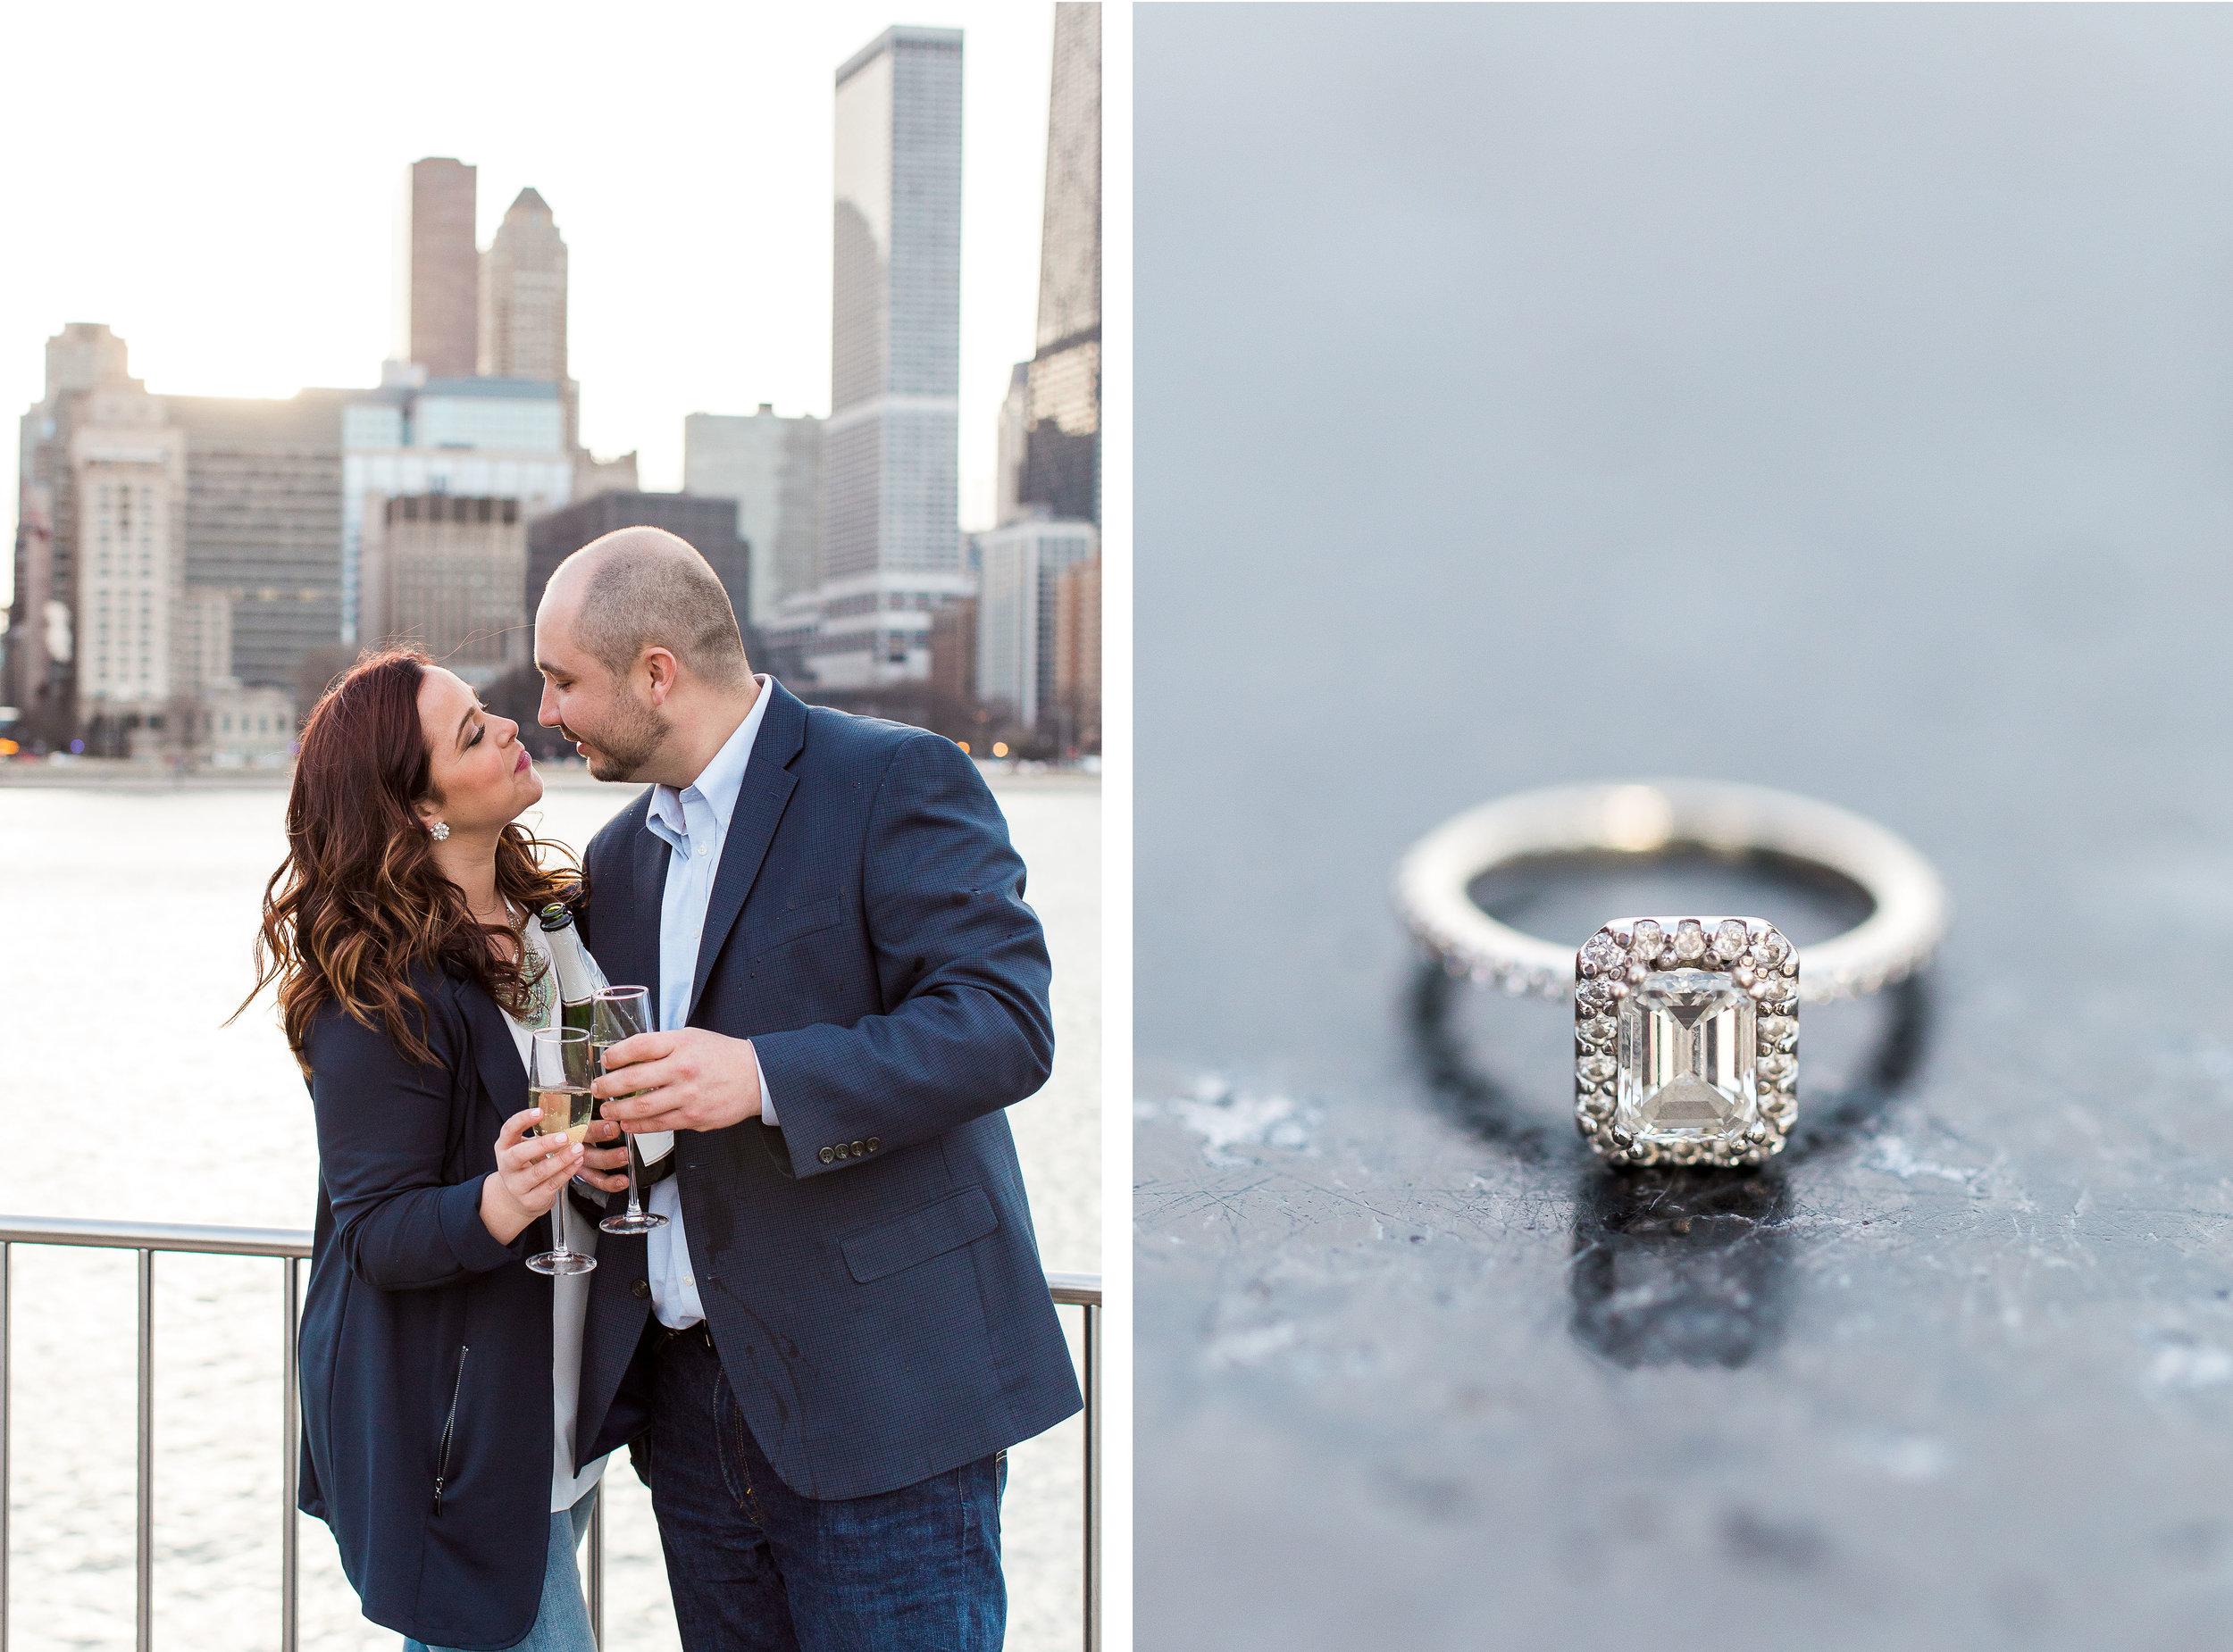 chicago-engagement-photographer-classy-olive-park-downtown-wedding-kristen-cloyd-20.jpg